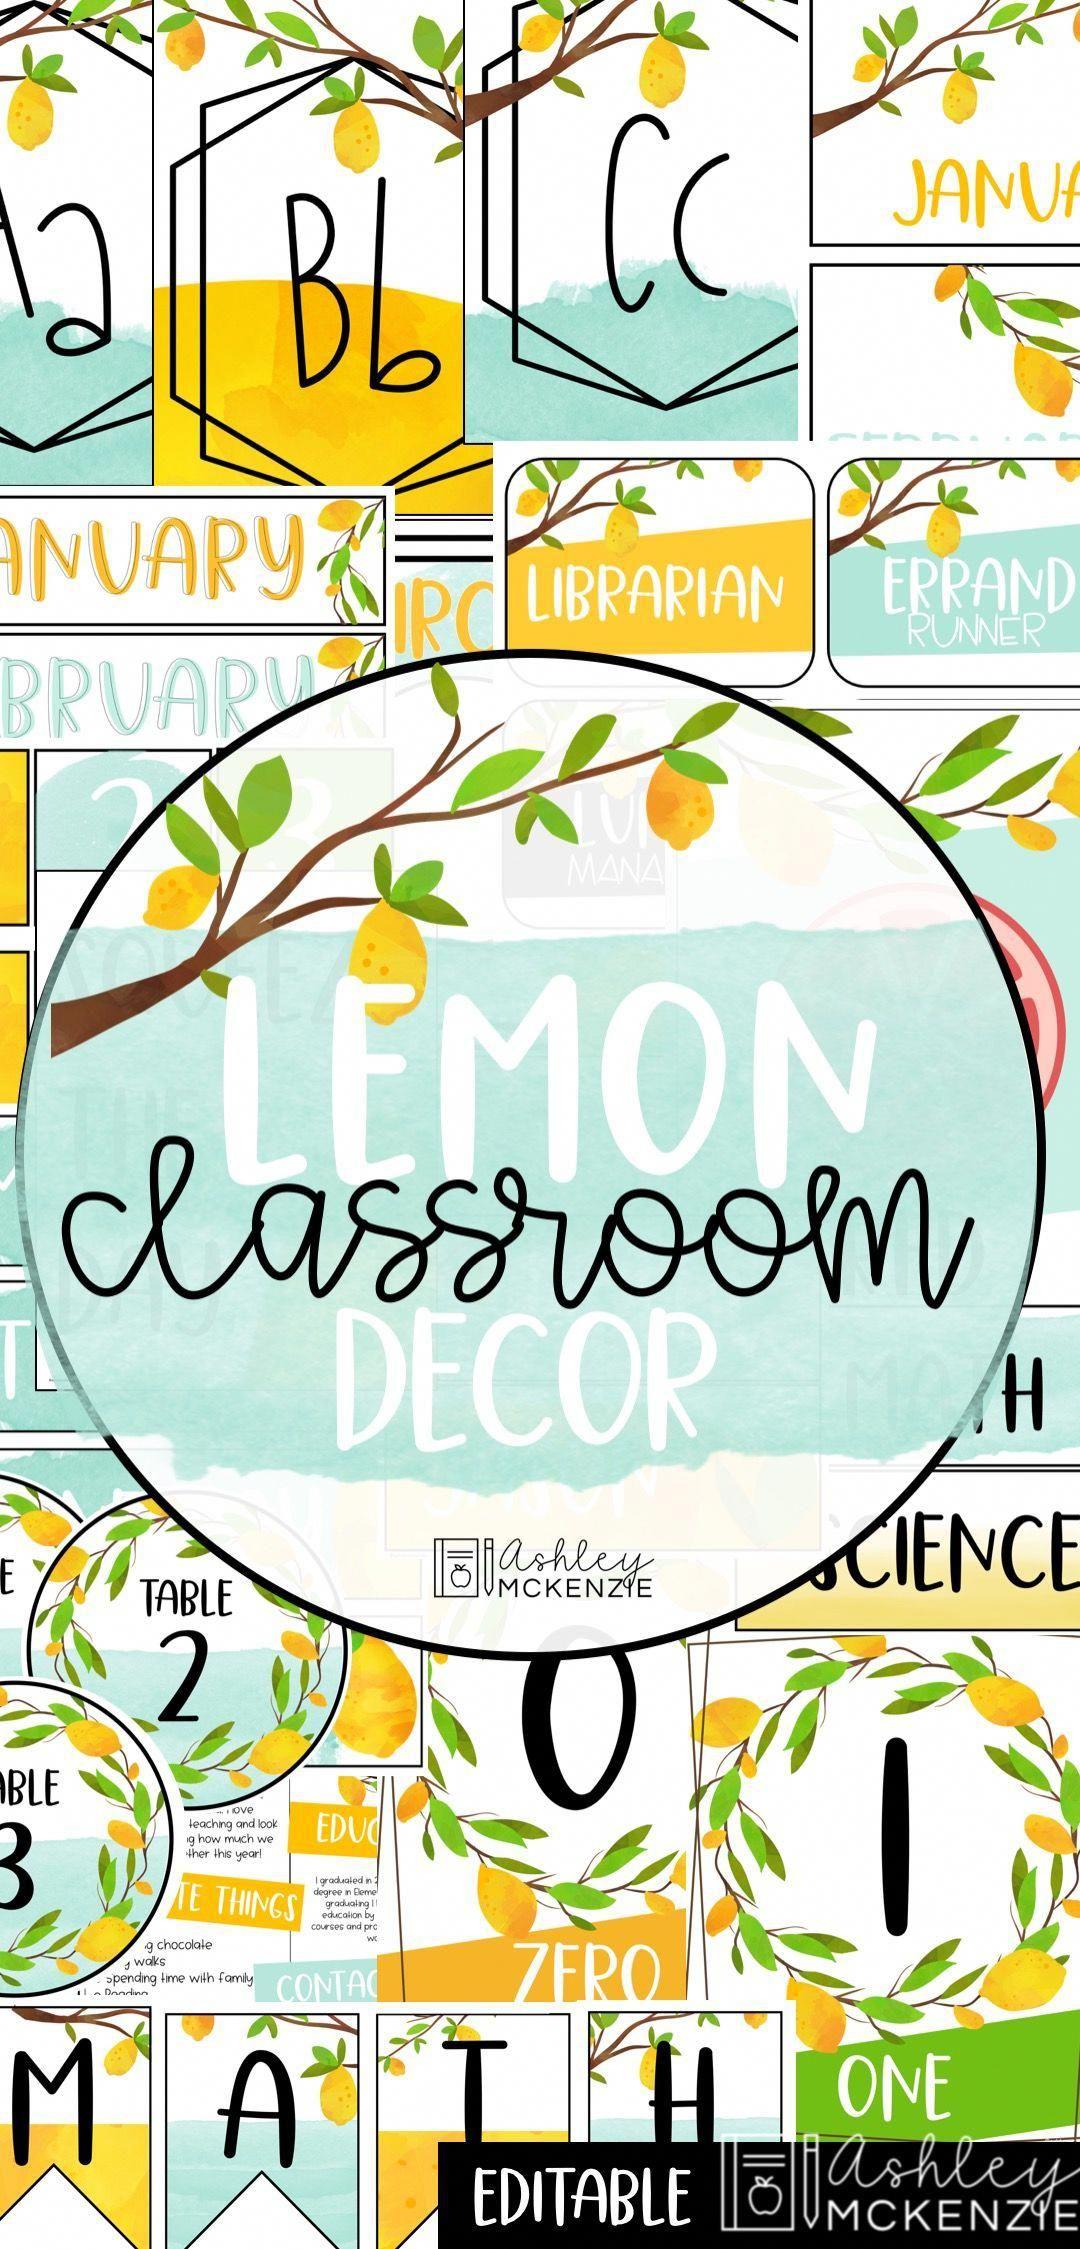 Lemon Classroom Decor